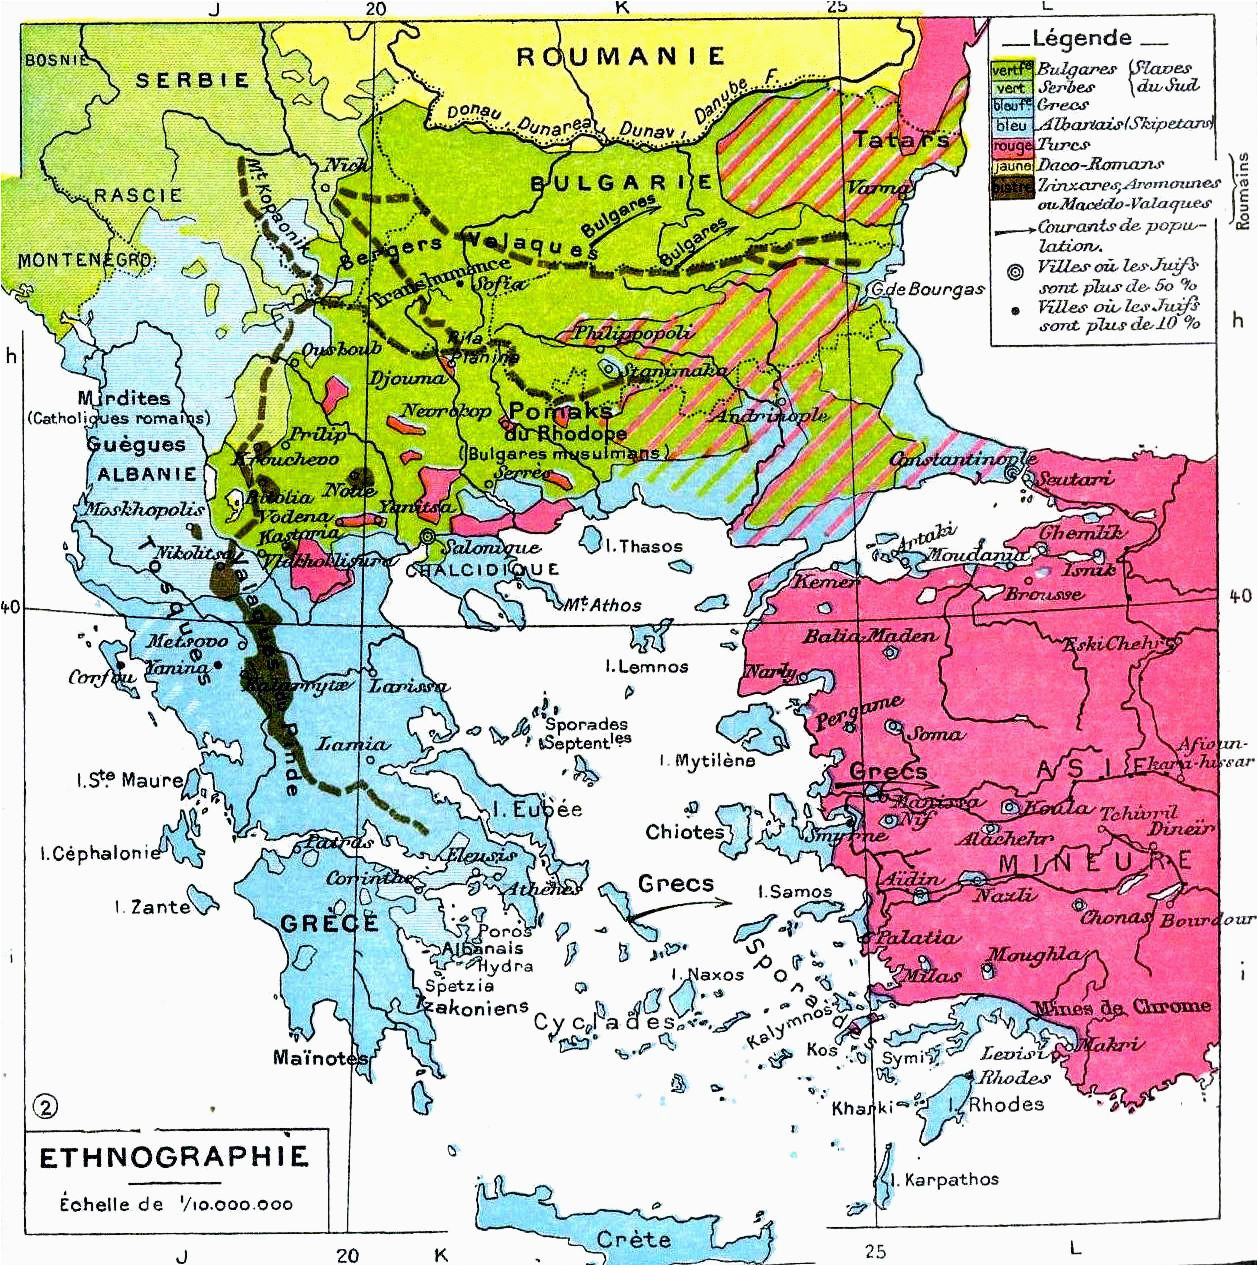 macedonians archive eupedia forum